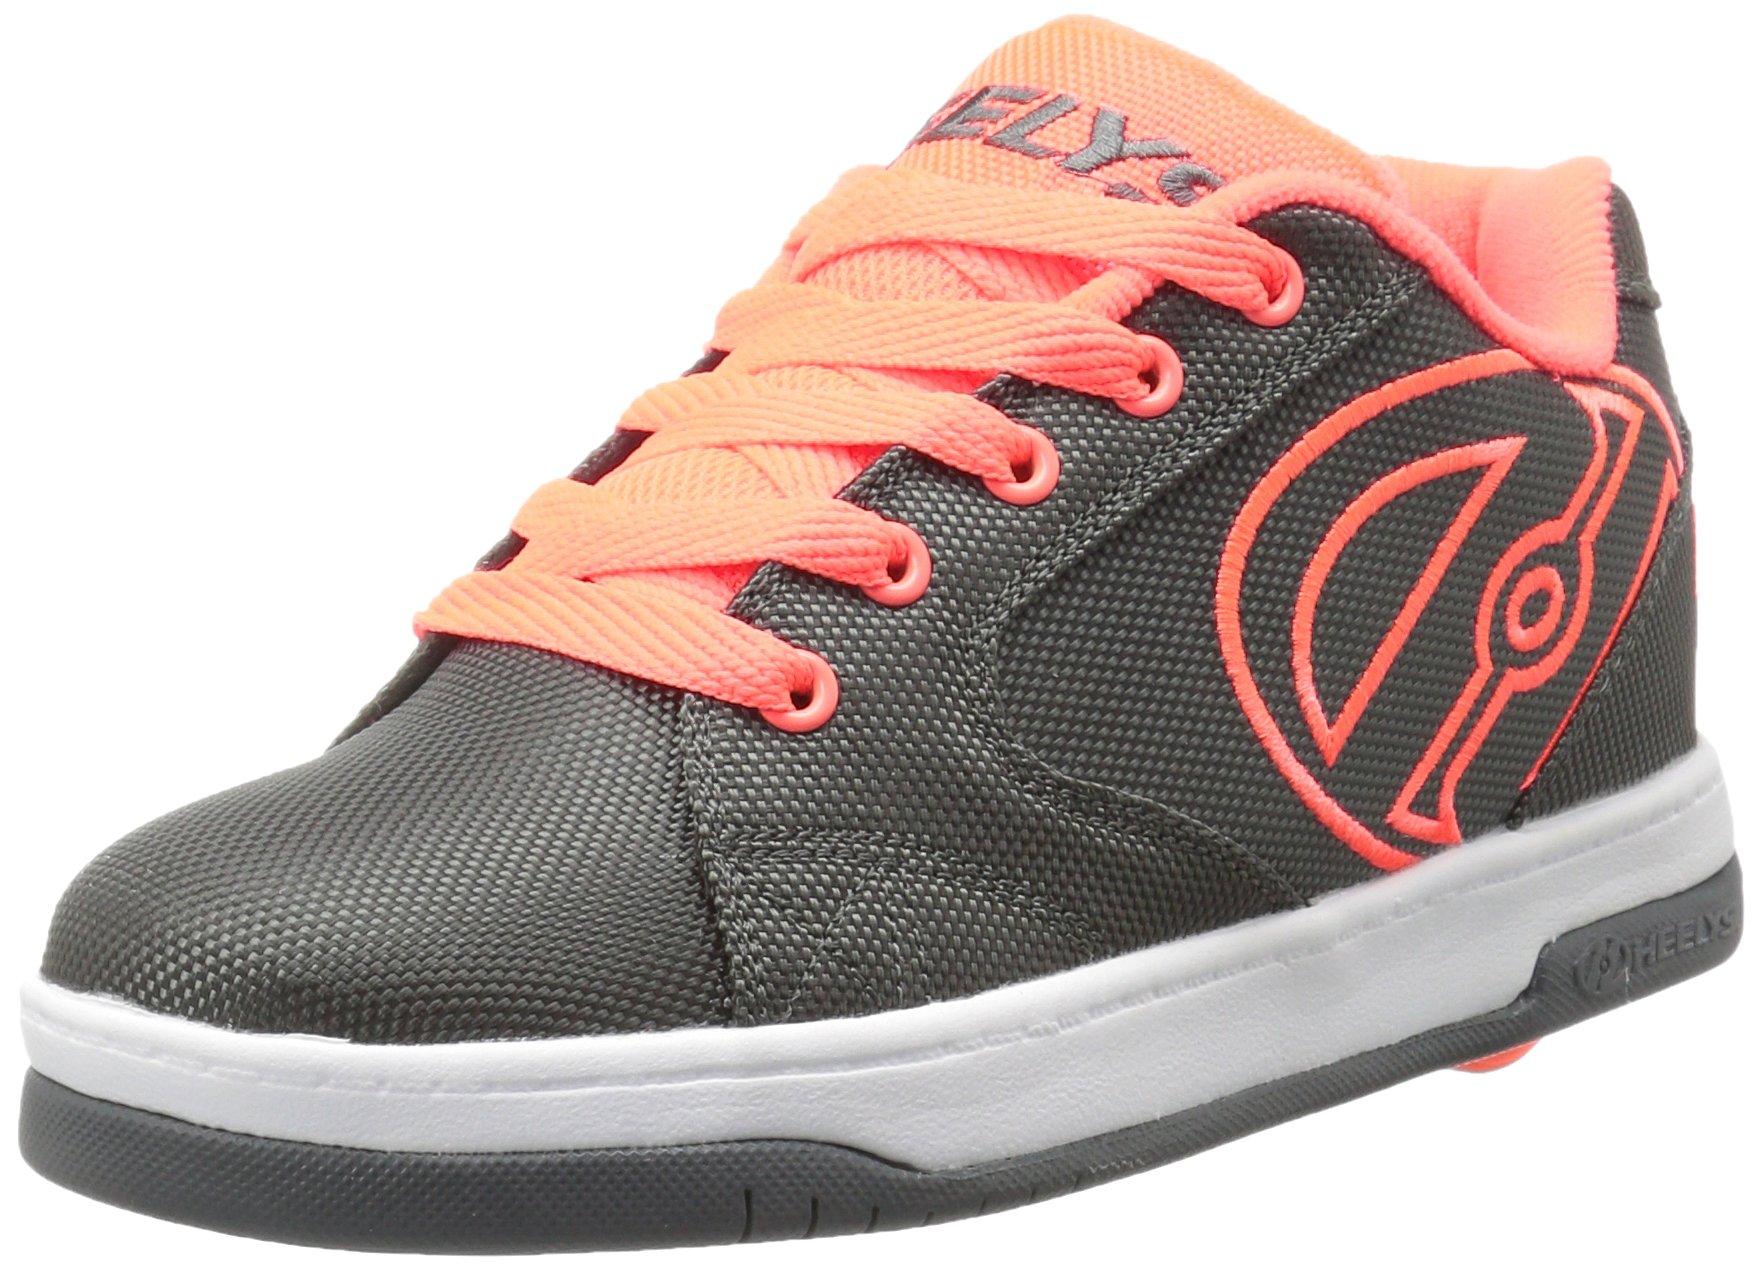 Heelys Boys' Propel 2.0 Sneaker, Charcoal/Orange, 8